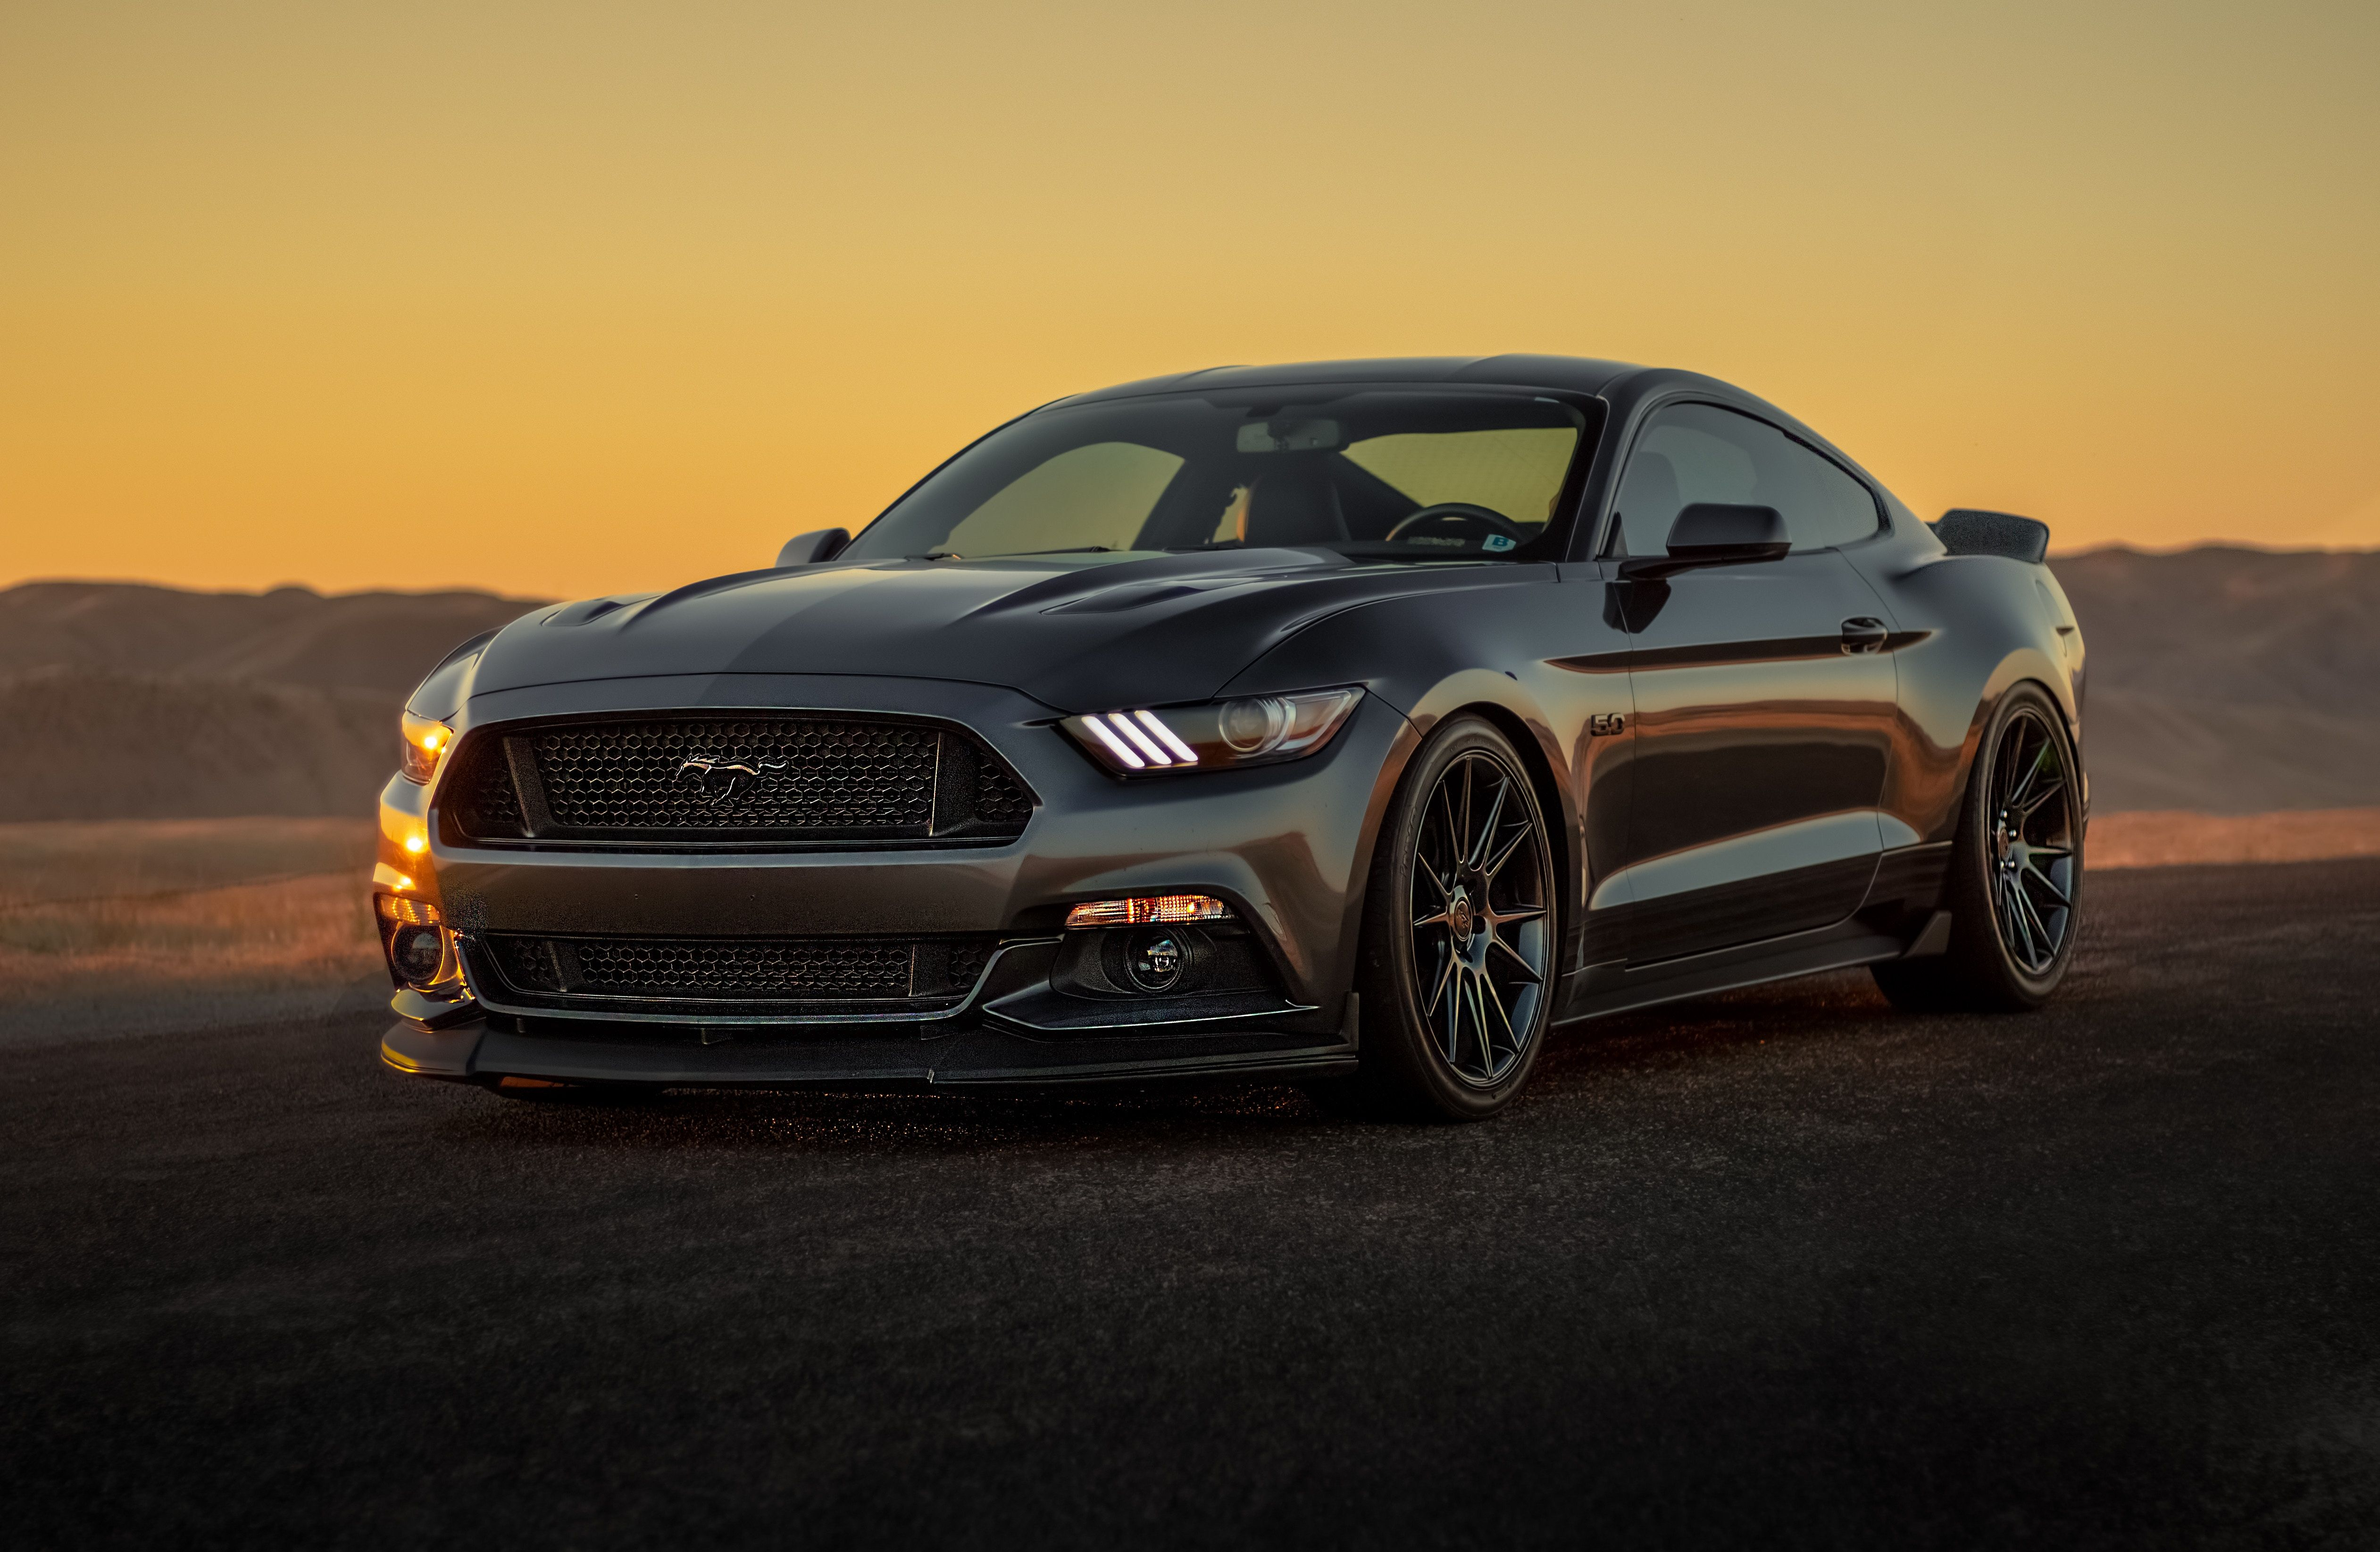 Black Mustang Wallpapers   Top Black Mustang Backgrounds 5045x3290